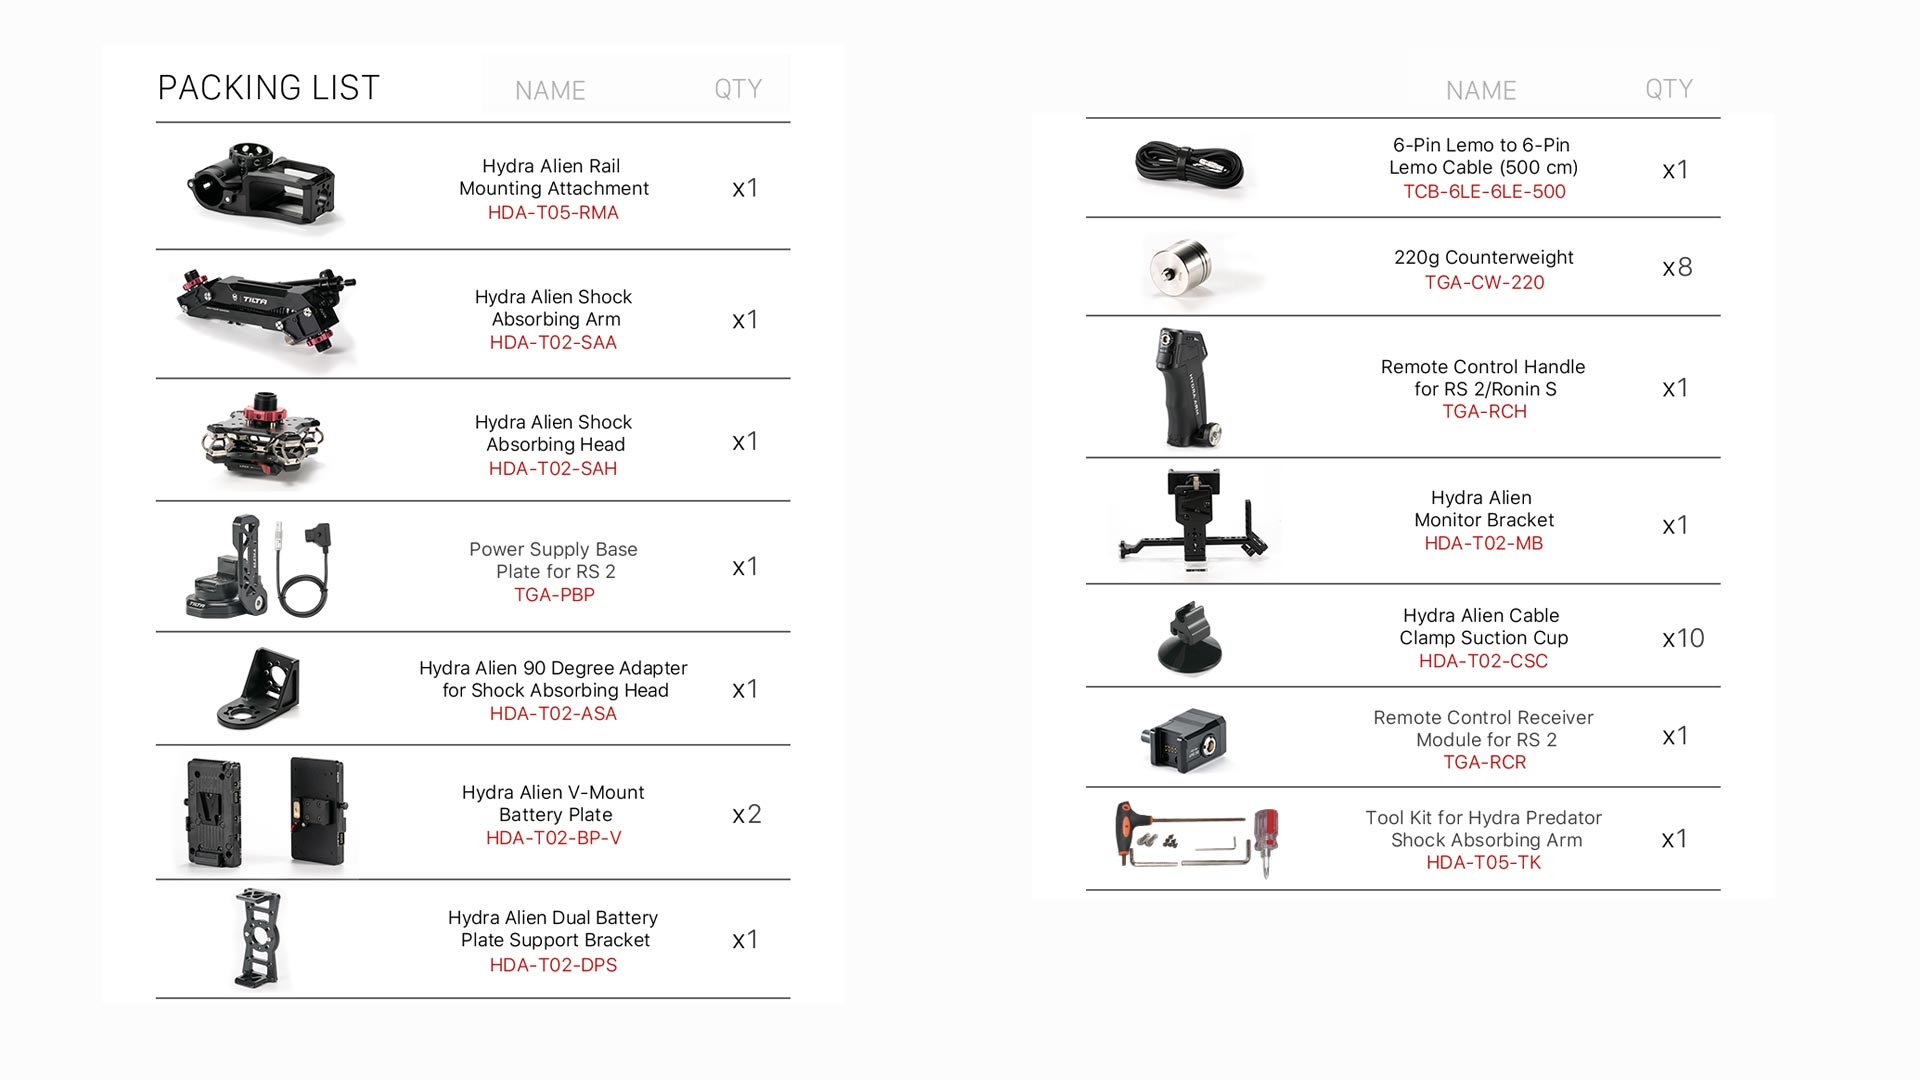 HDA-T05 packing list